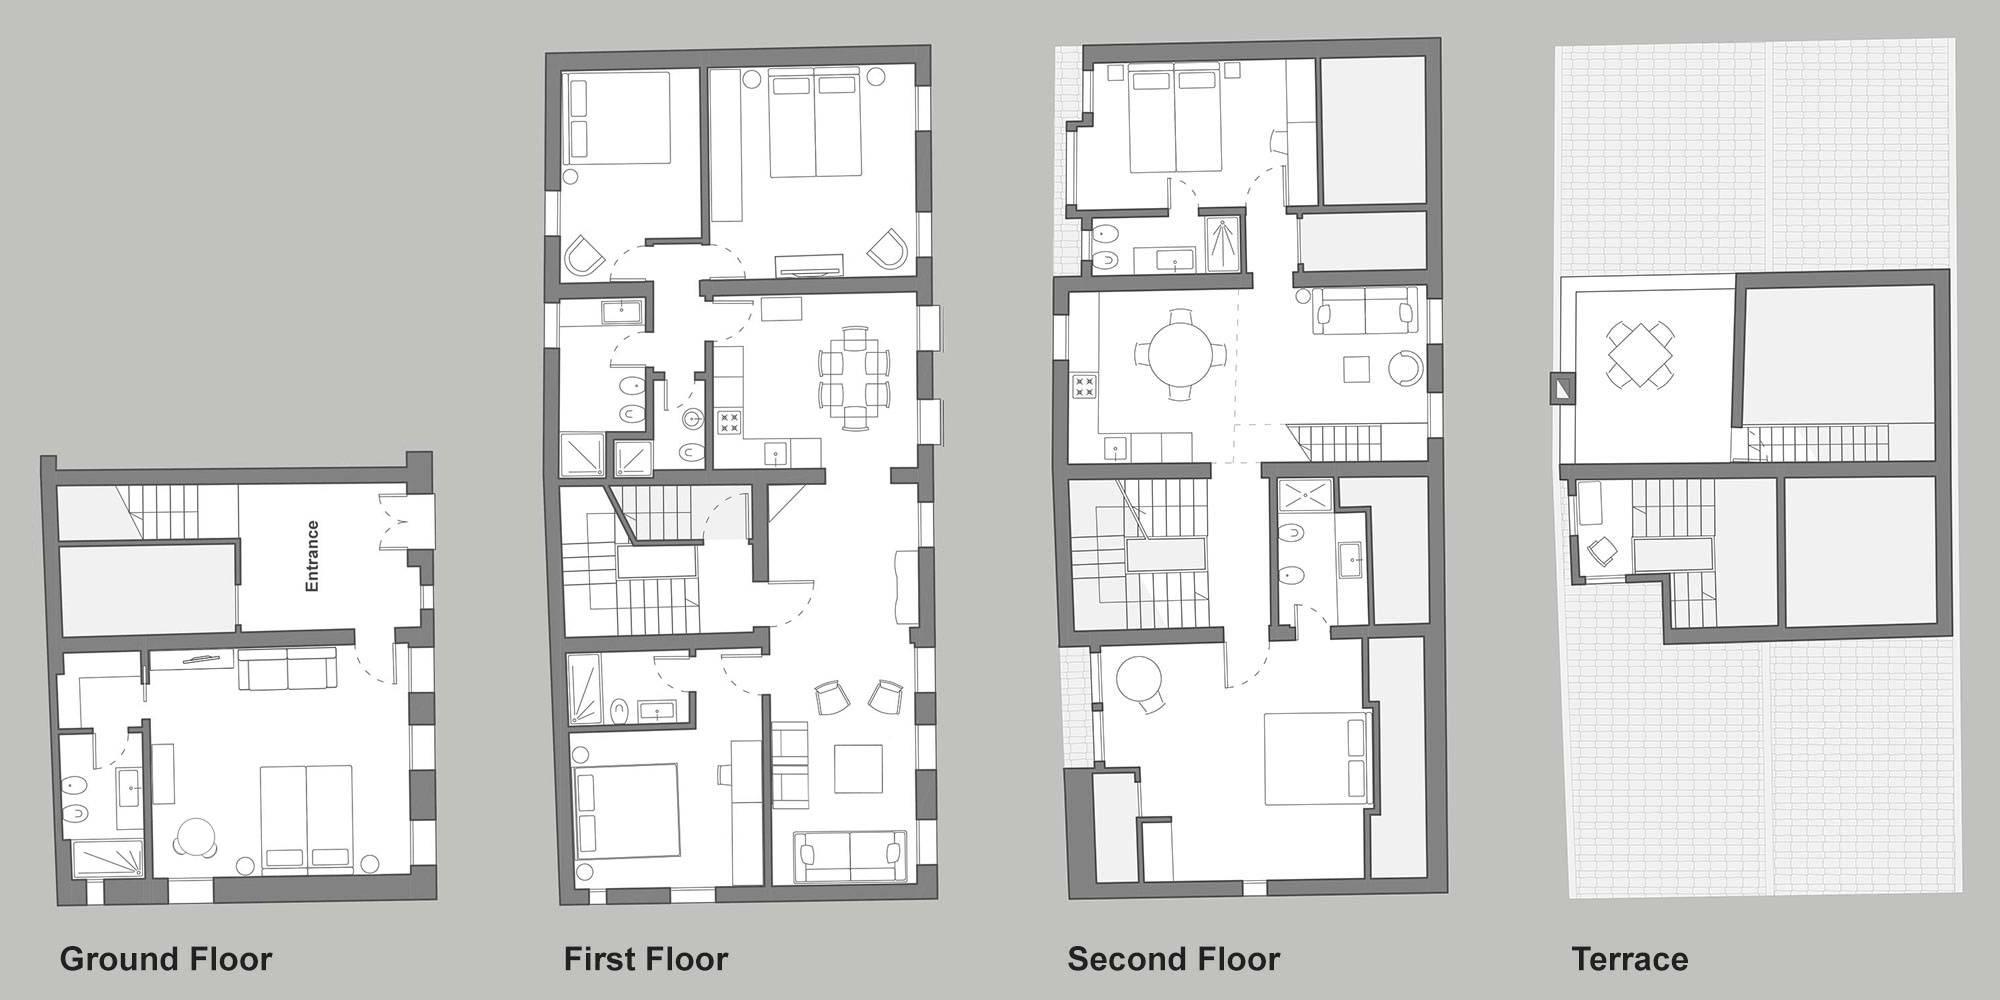 Palazzetto San Trovaso floor plan